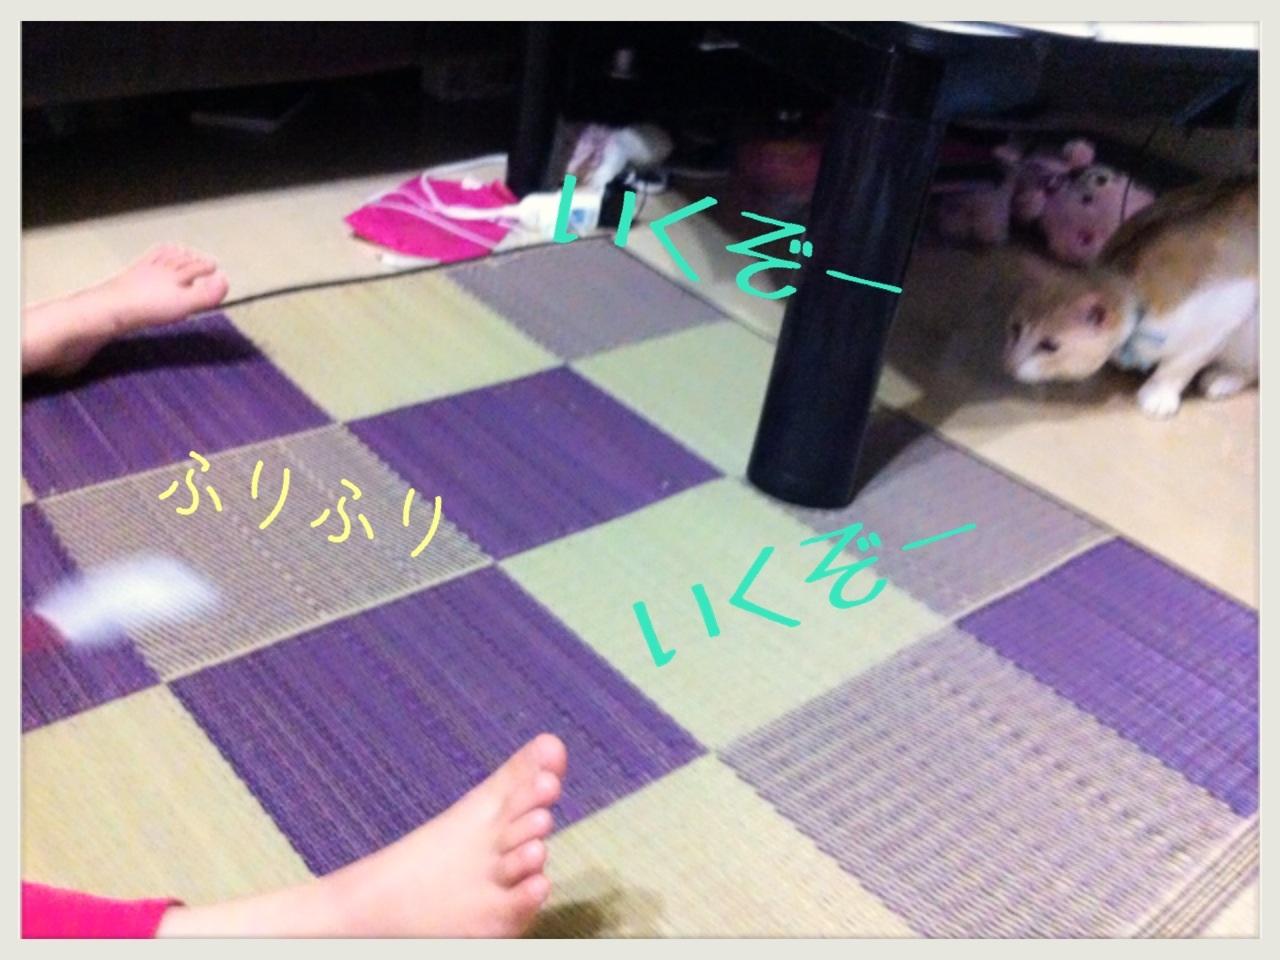 image_20130709152934.jpg